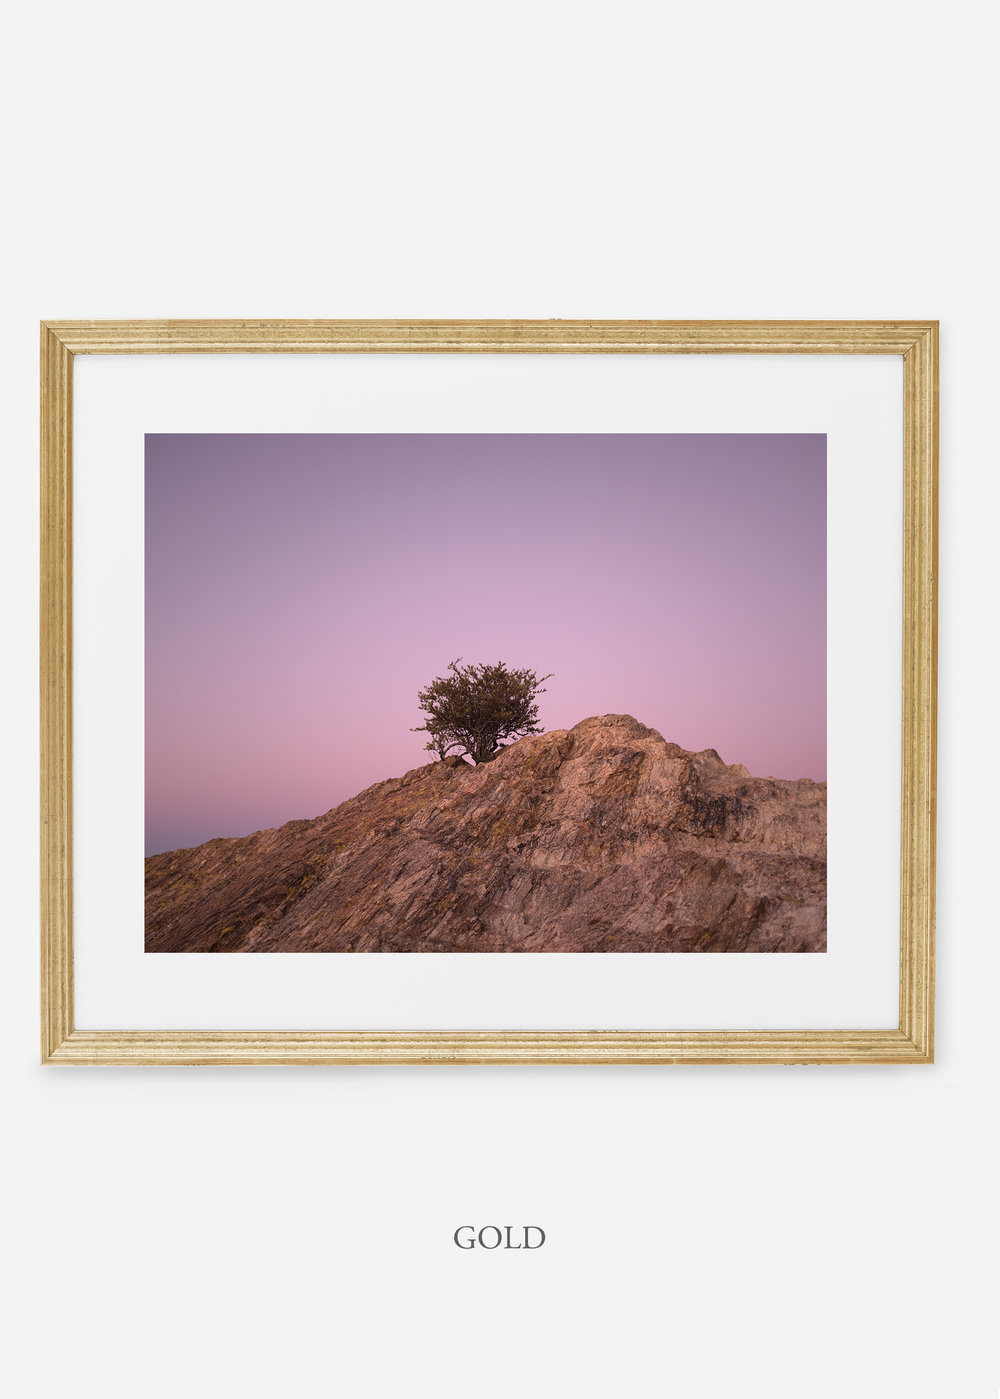 goldframe-saguaroNo.11-wildercalifornia-art-wallart-cactusprint-homedecor-prints-arizona-botanical-artwork-interiordesign.jpg